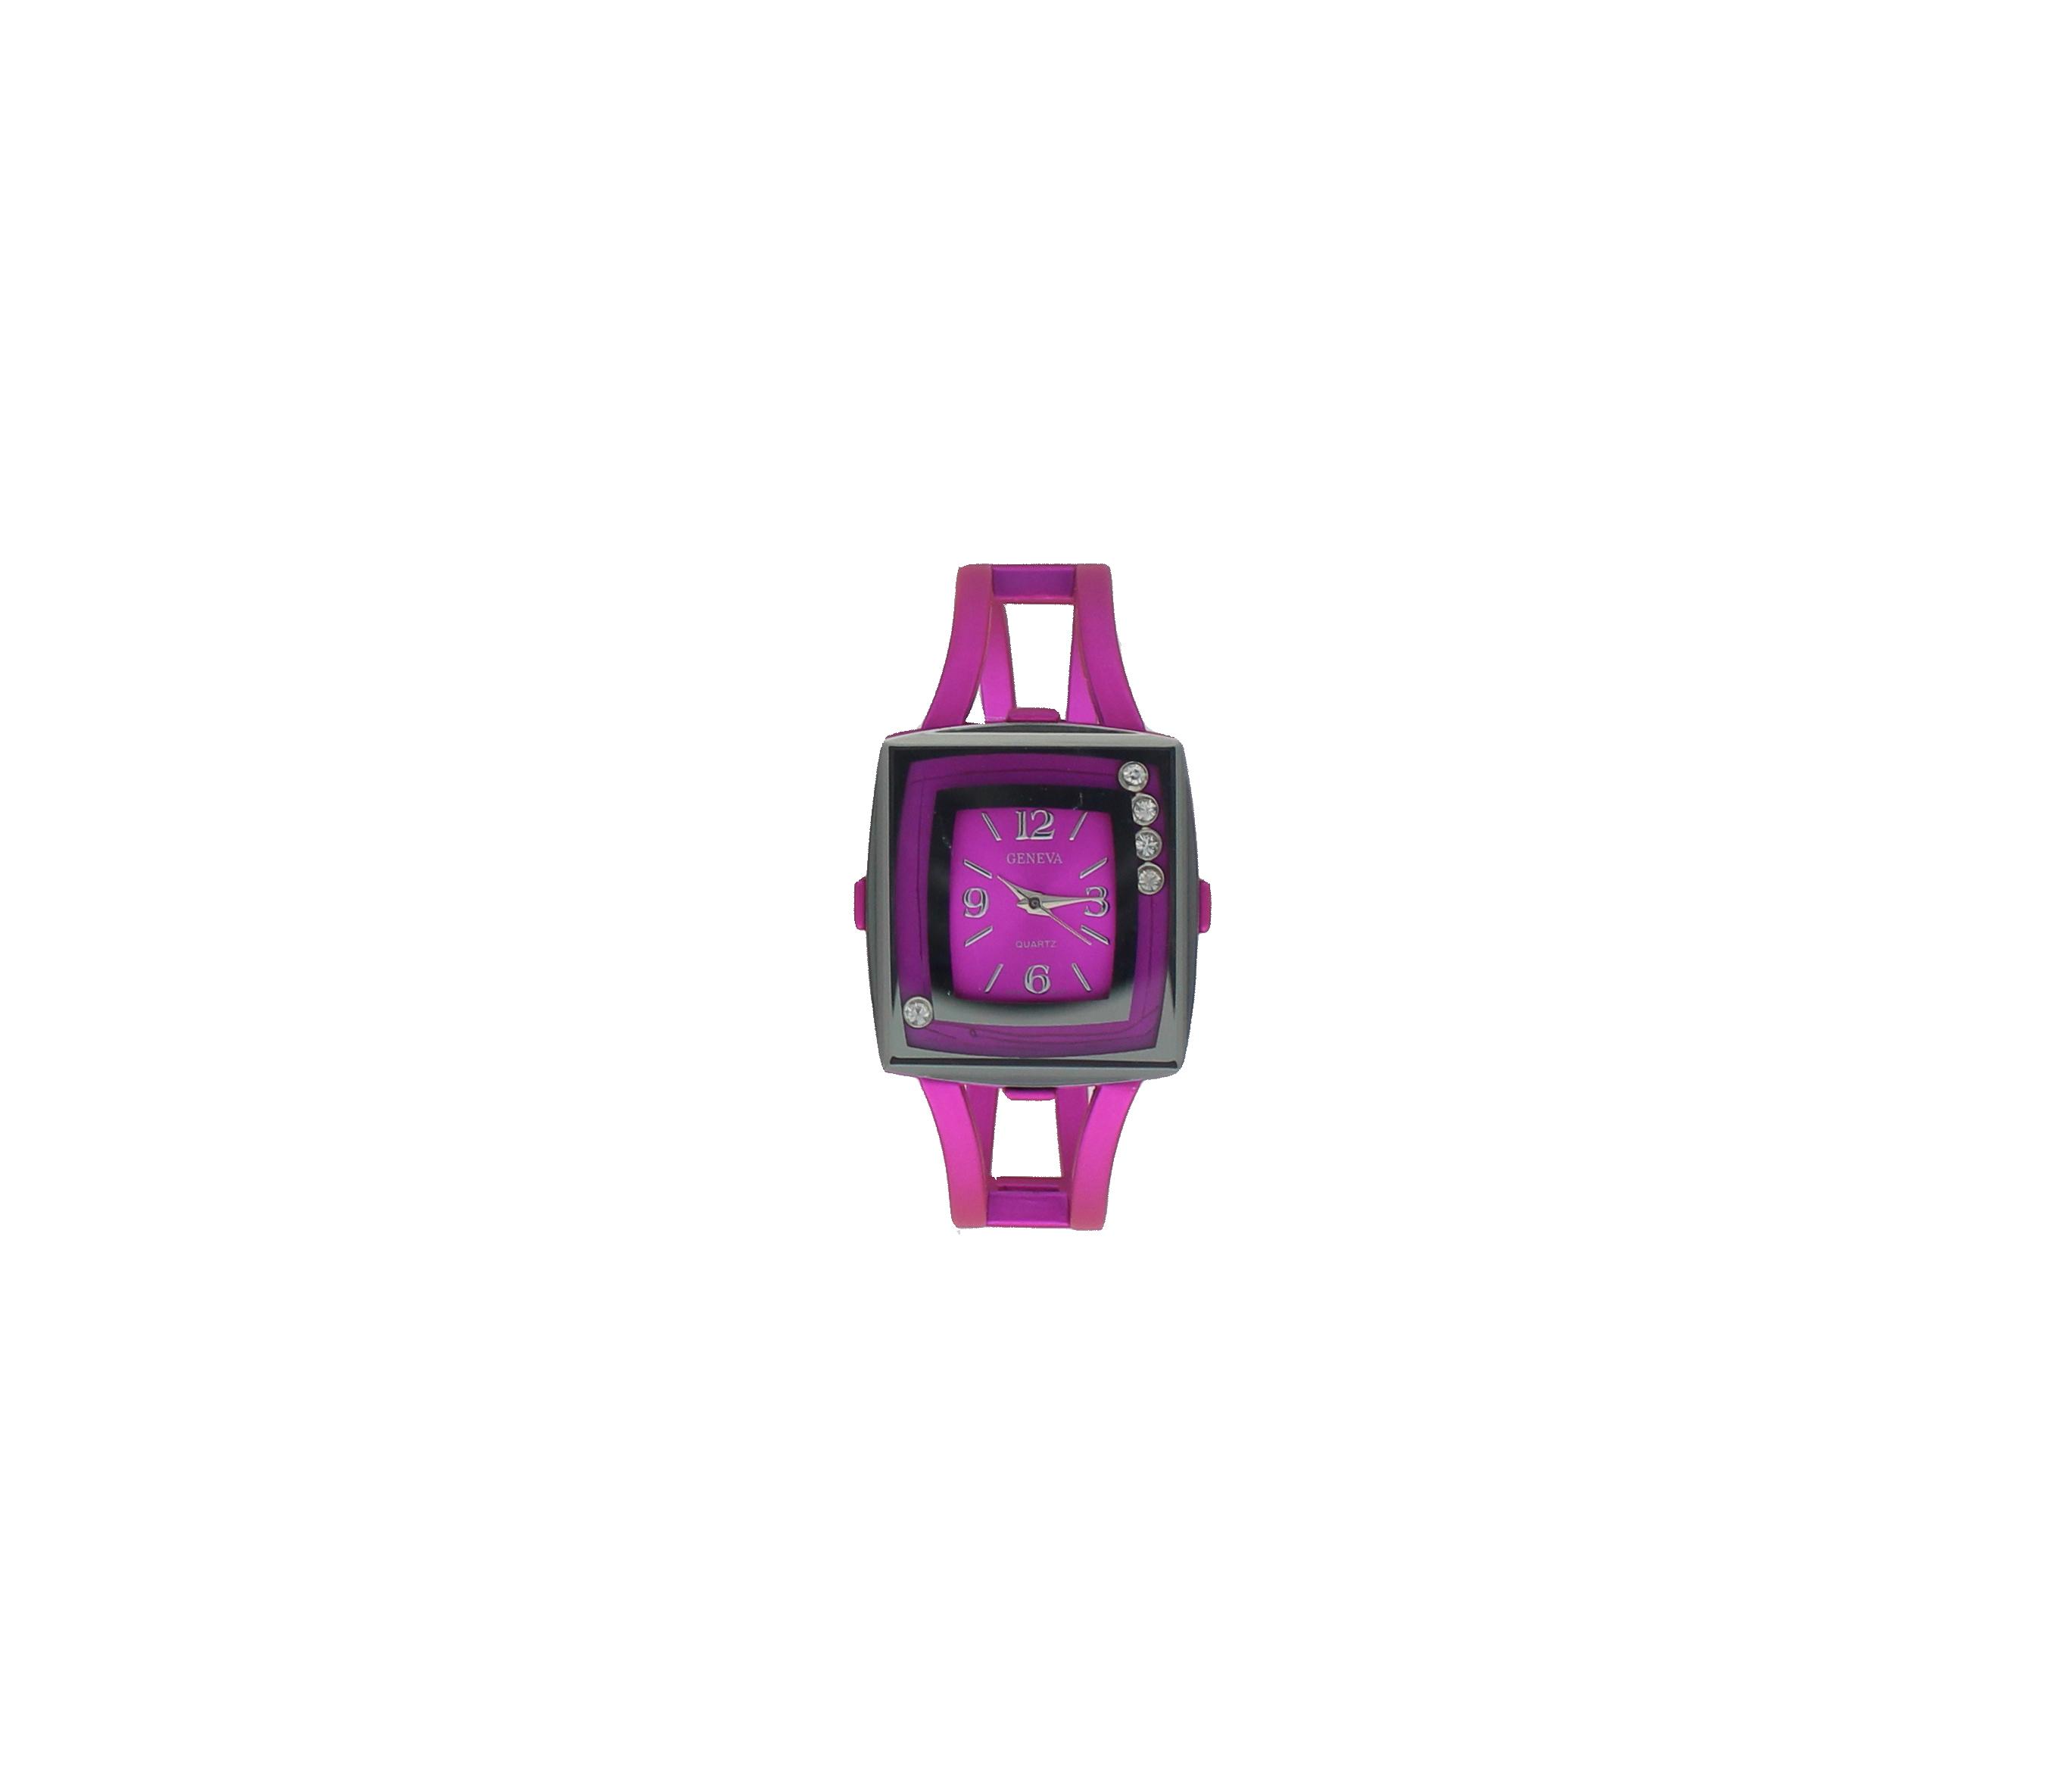 Square Face Metallic Watch